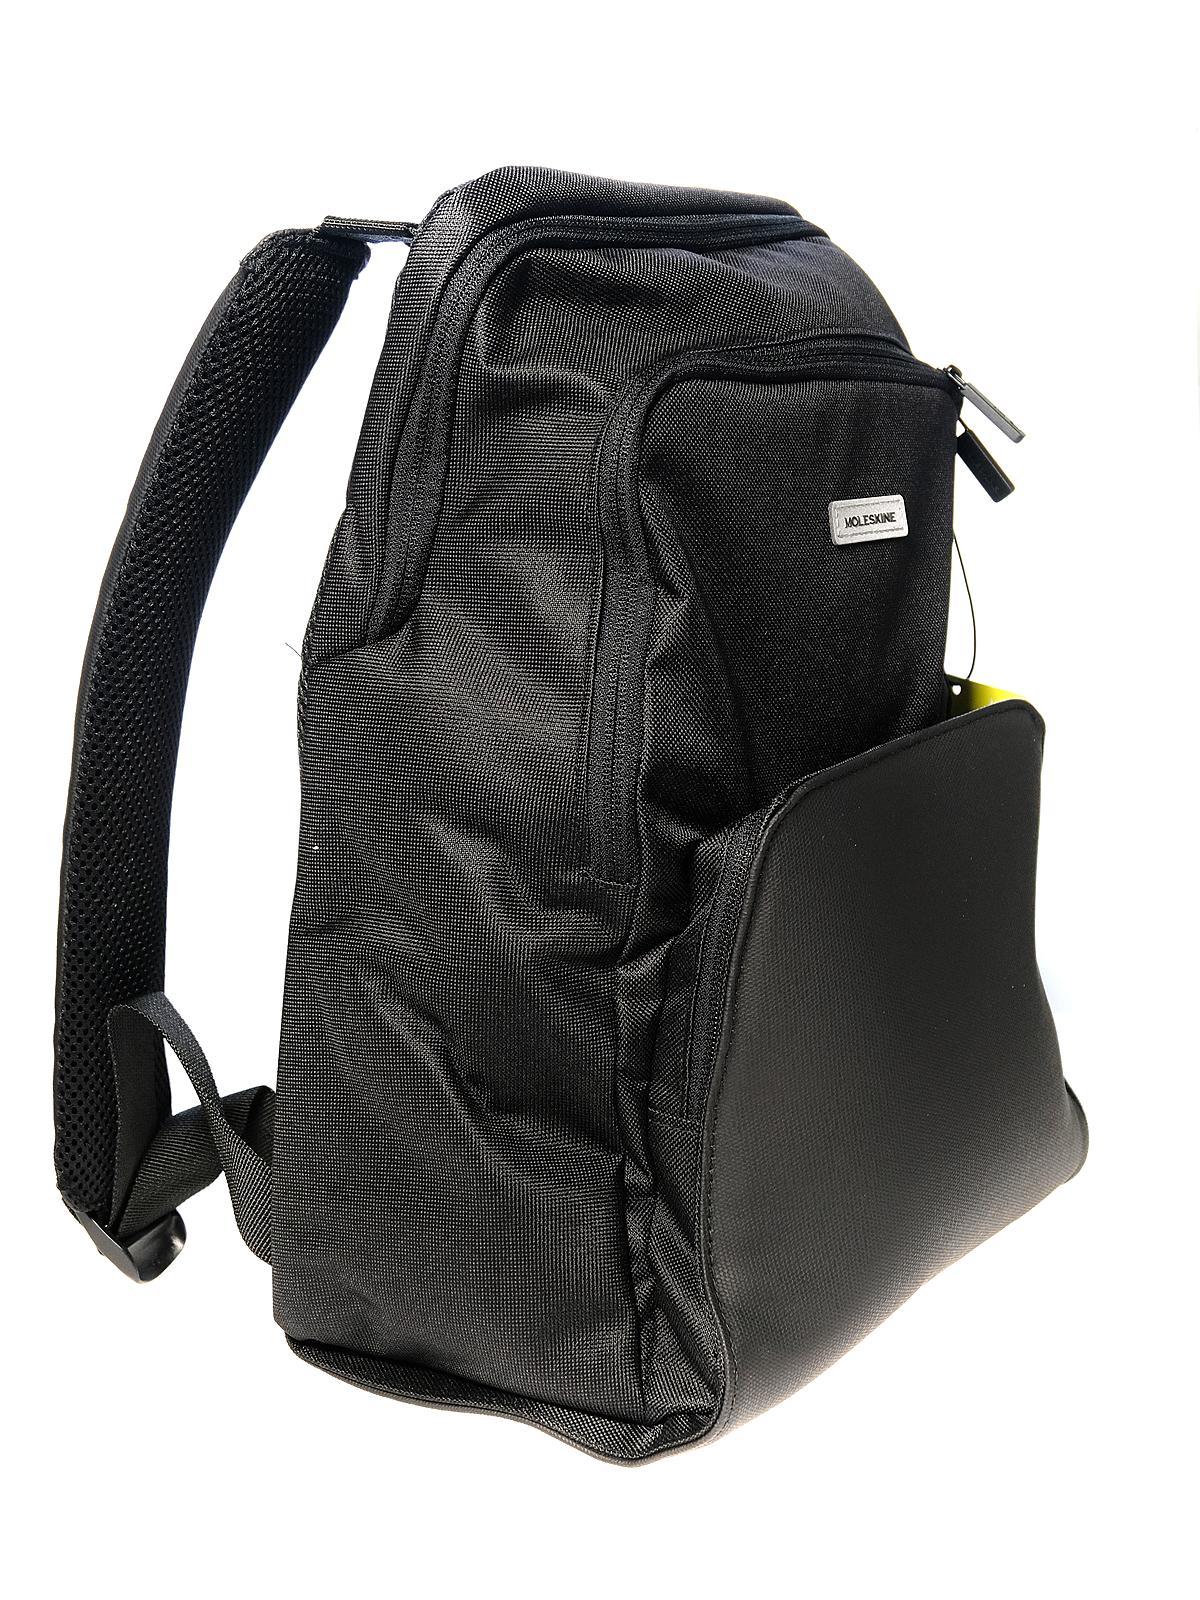 Moleskine Nomad Backpack medium black